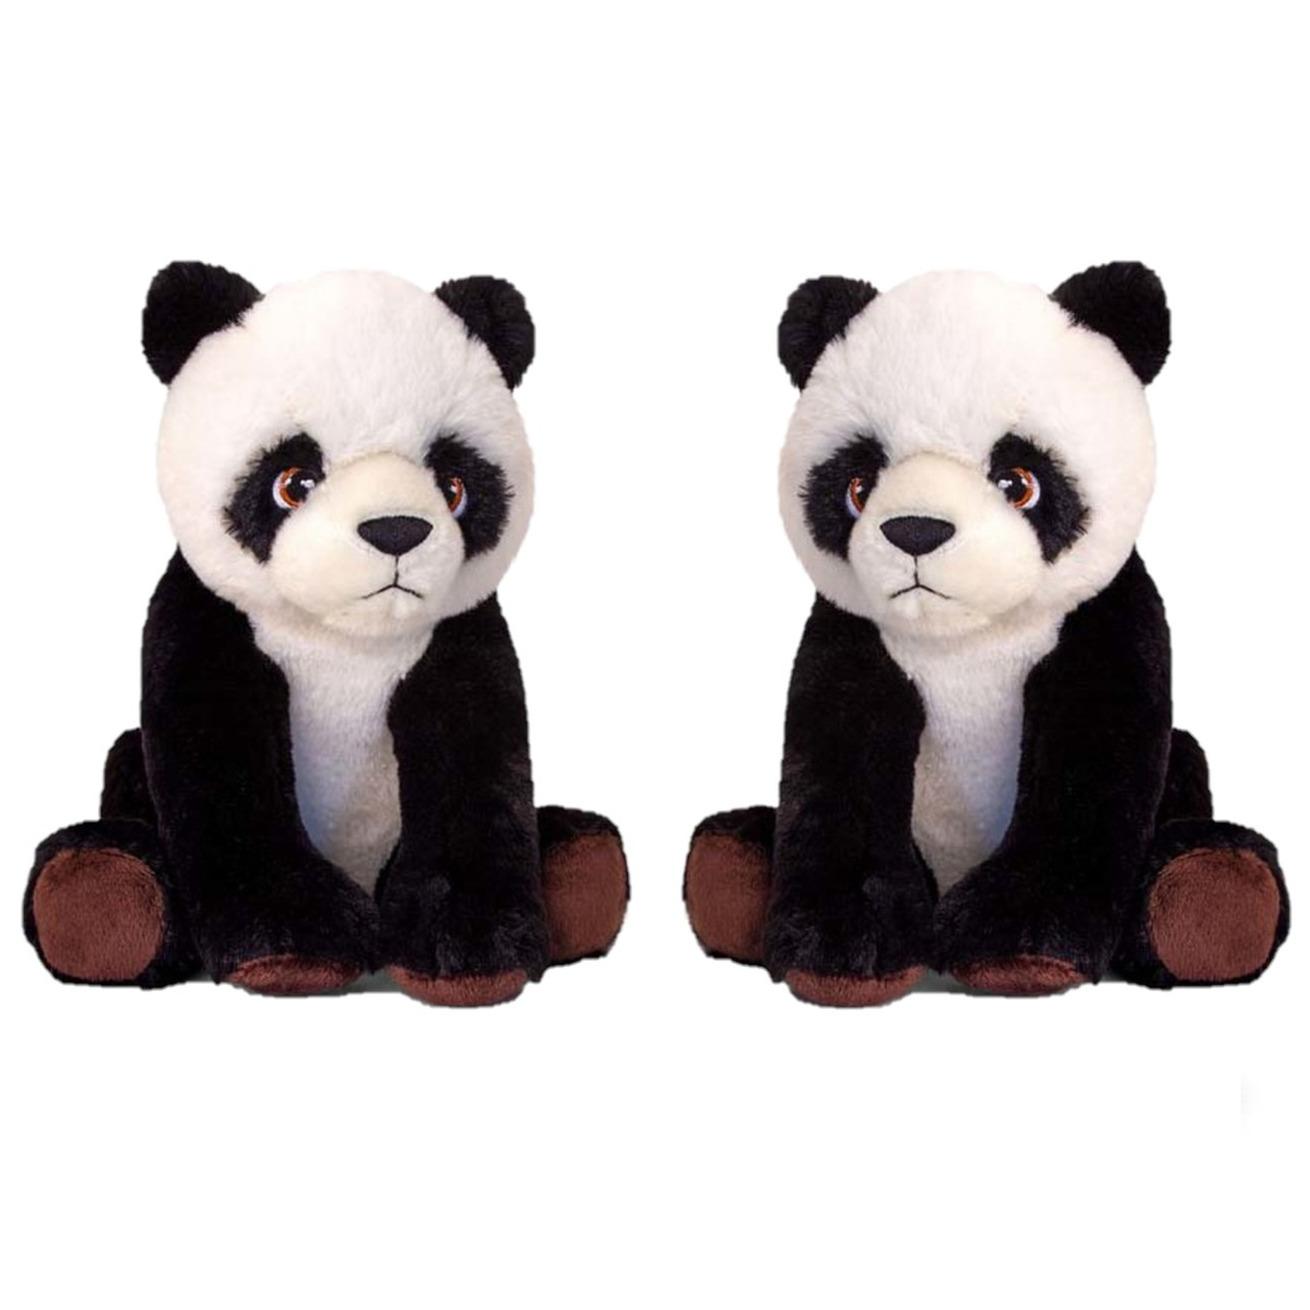 2x stuks kinder knuffels panda beer van 25 cm